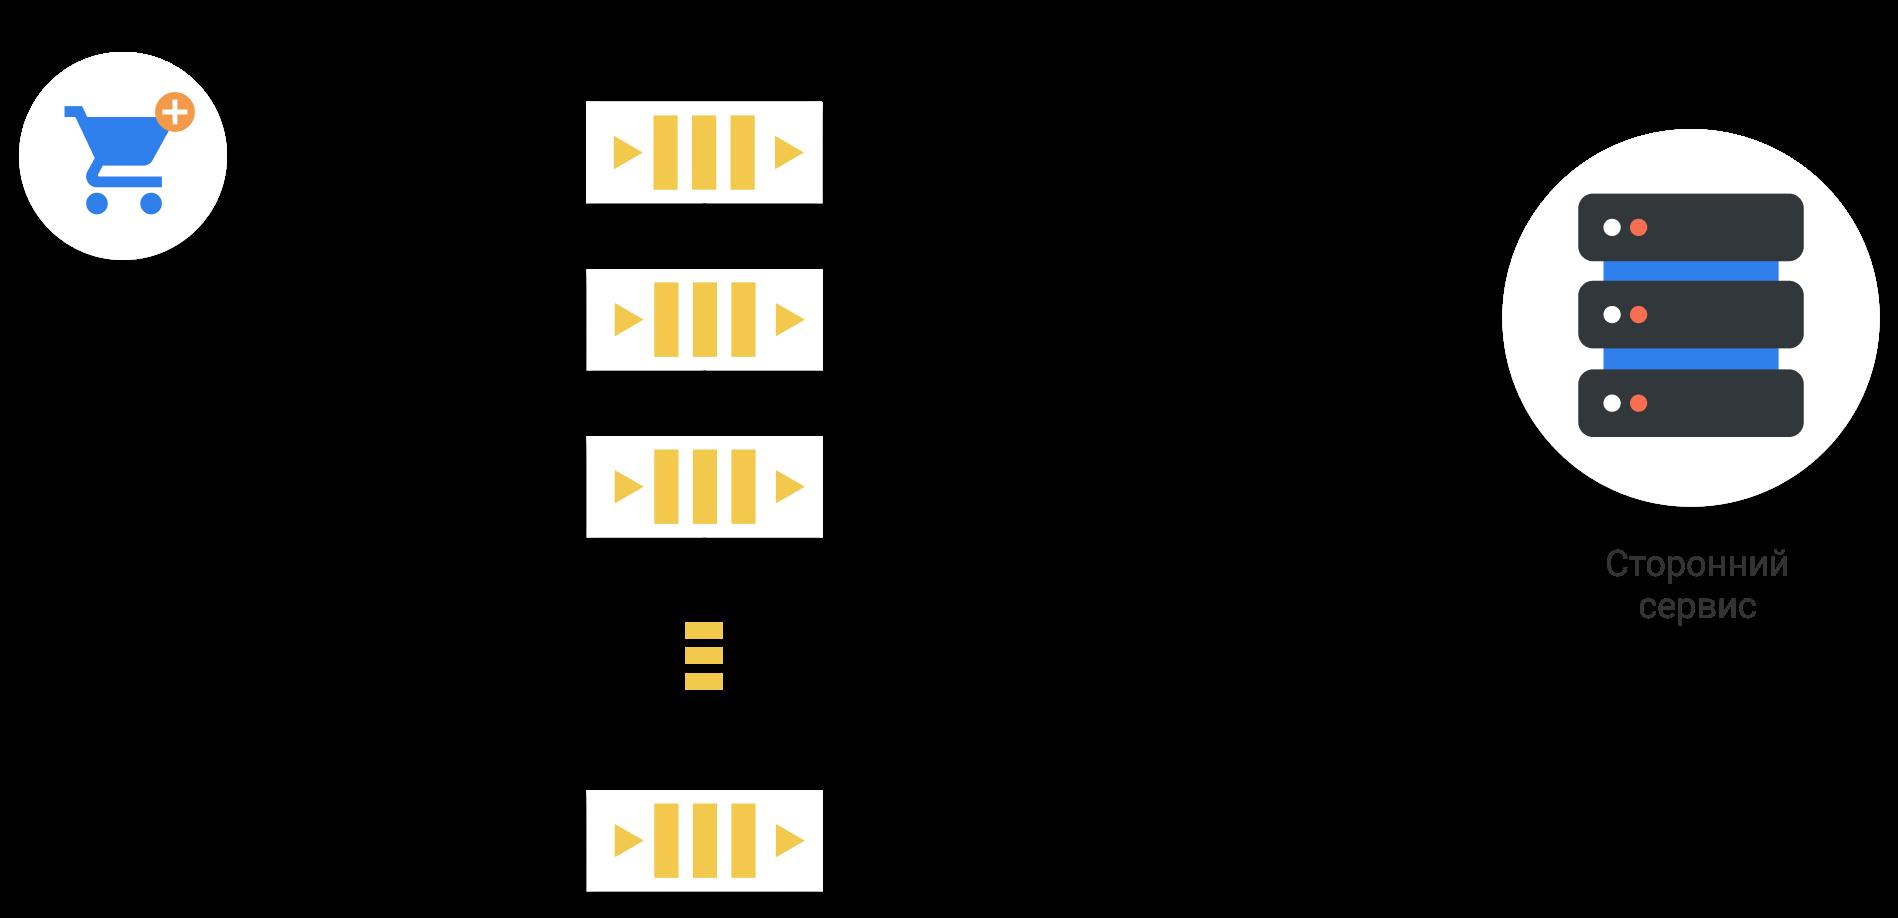 Реализация вебхуков на примере взаимодействия сторонних сервисов с онлайн-кассами - 2